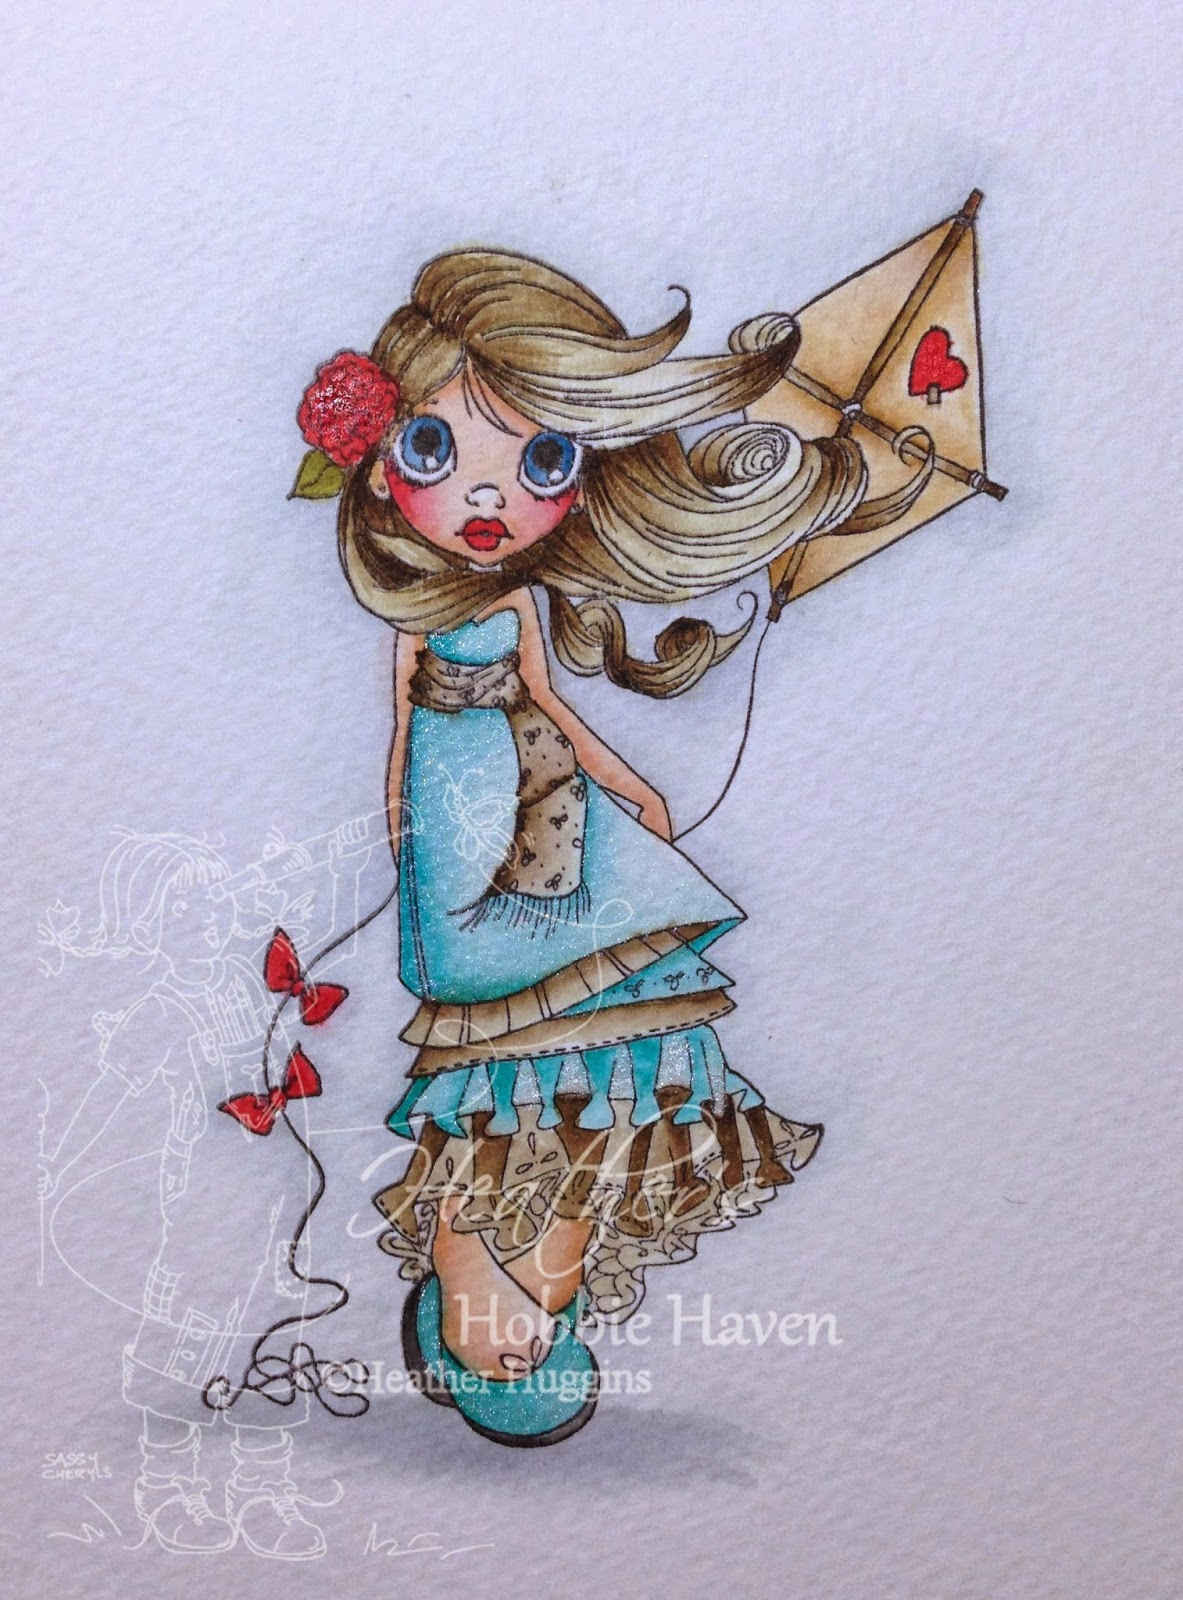 Heather's Hobbie Haven - Alternate Coloring